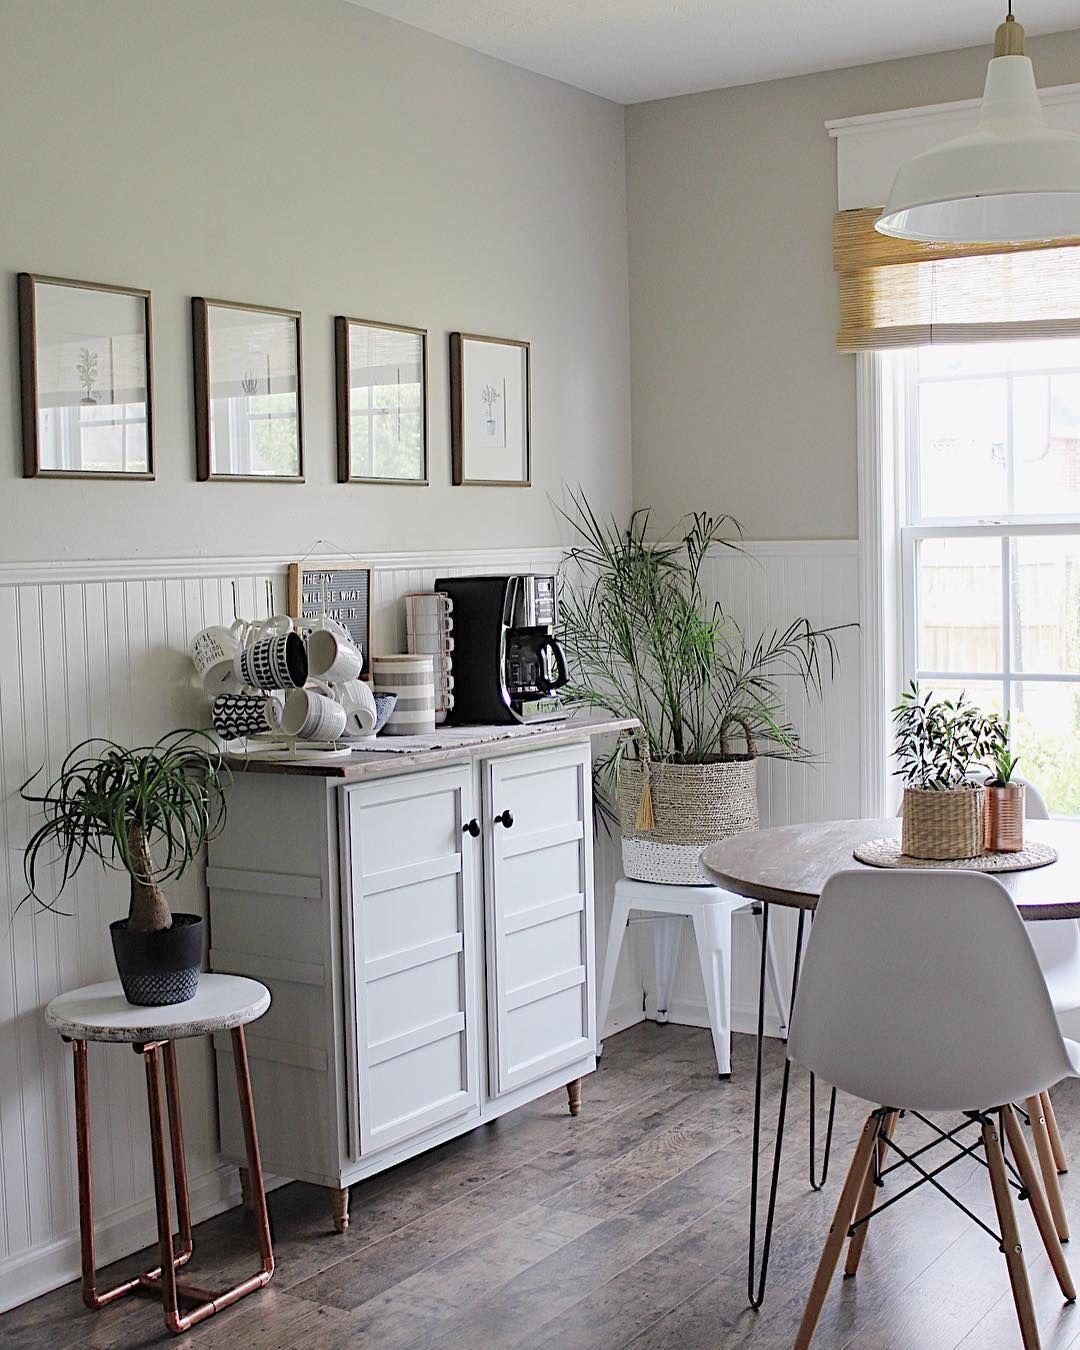 Wall Paint Sherwin Williams Wintersweet Gray It S Valspar